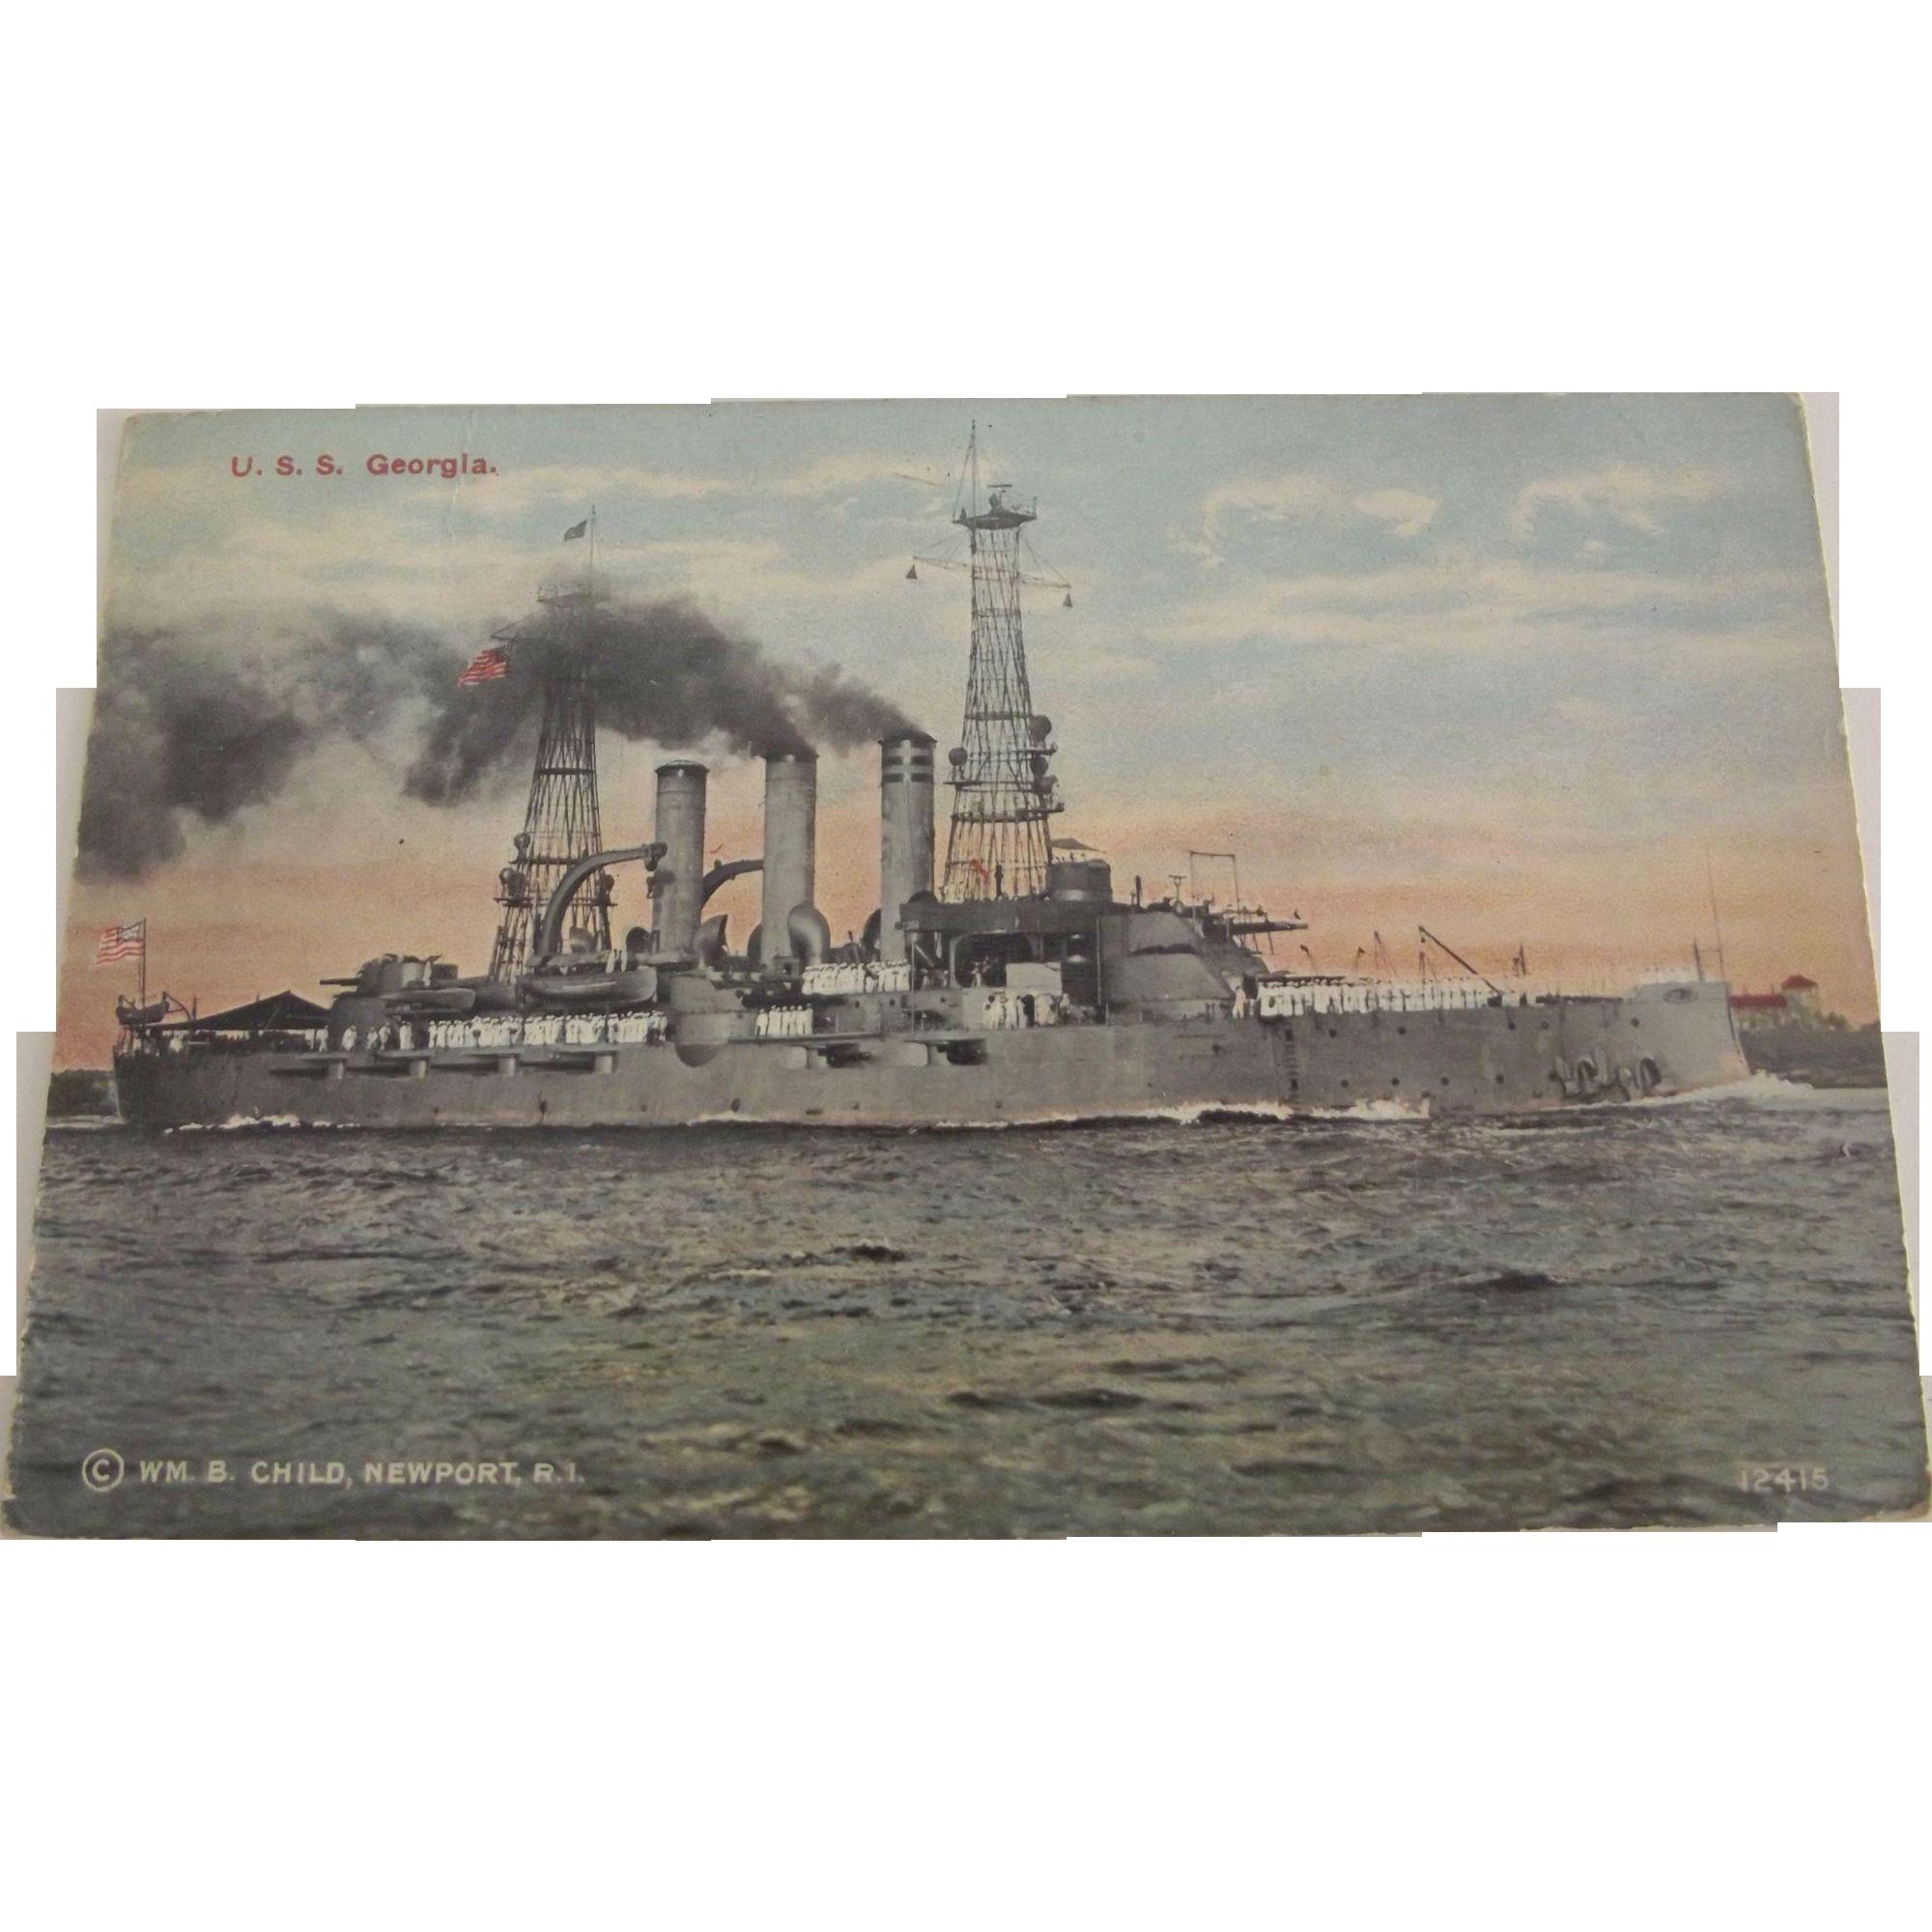 Postcard of U.S.S. Georgia